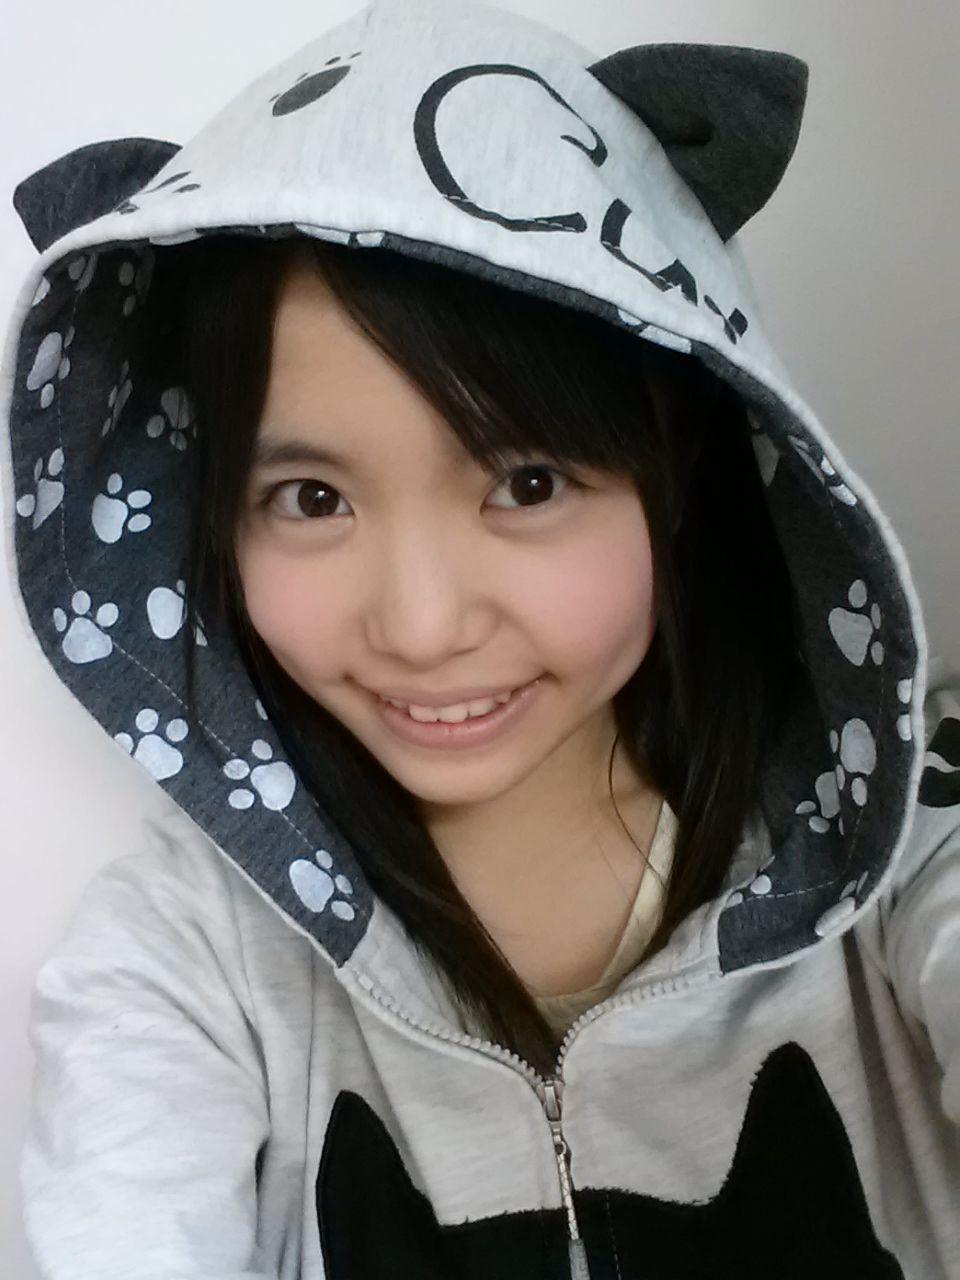 http://livedoor.blogimg.jp/otohaeika/imgs/4/8/48c8c5d3.jpg